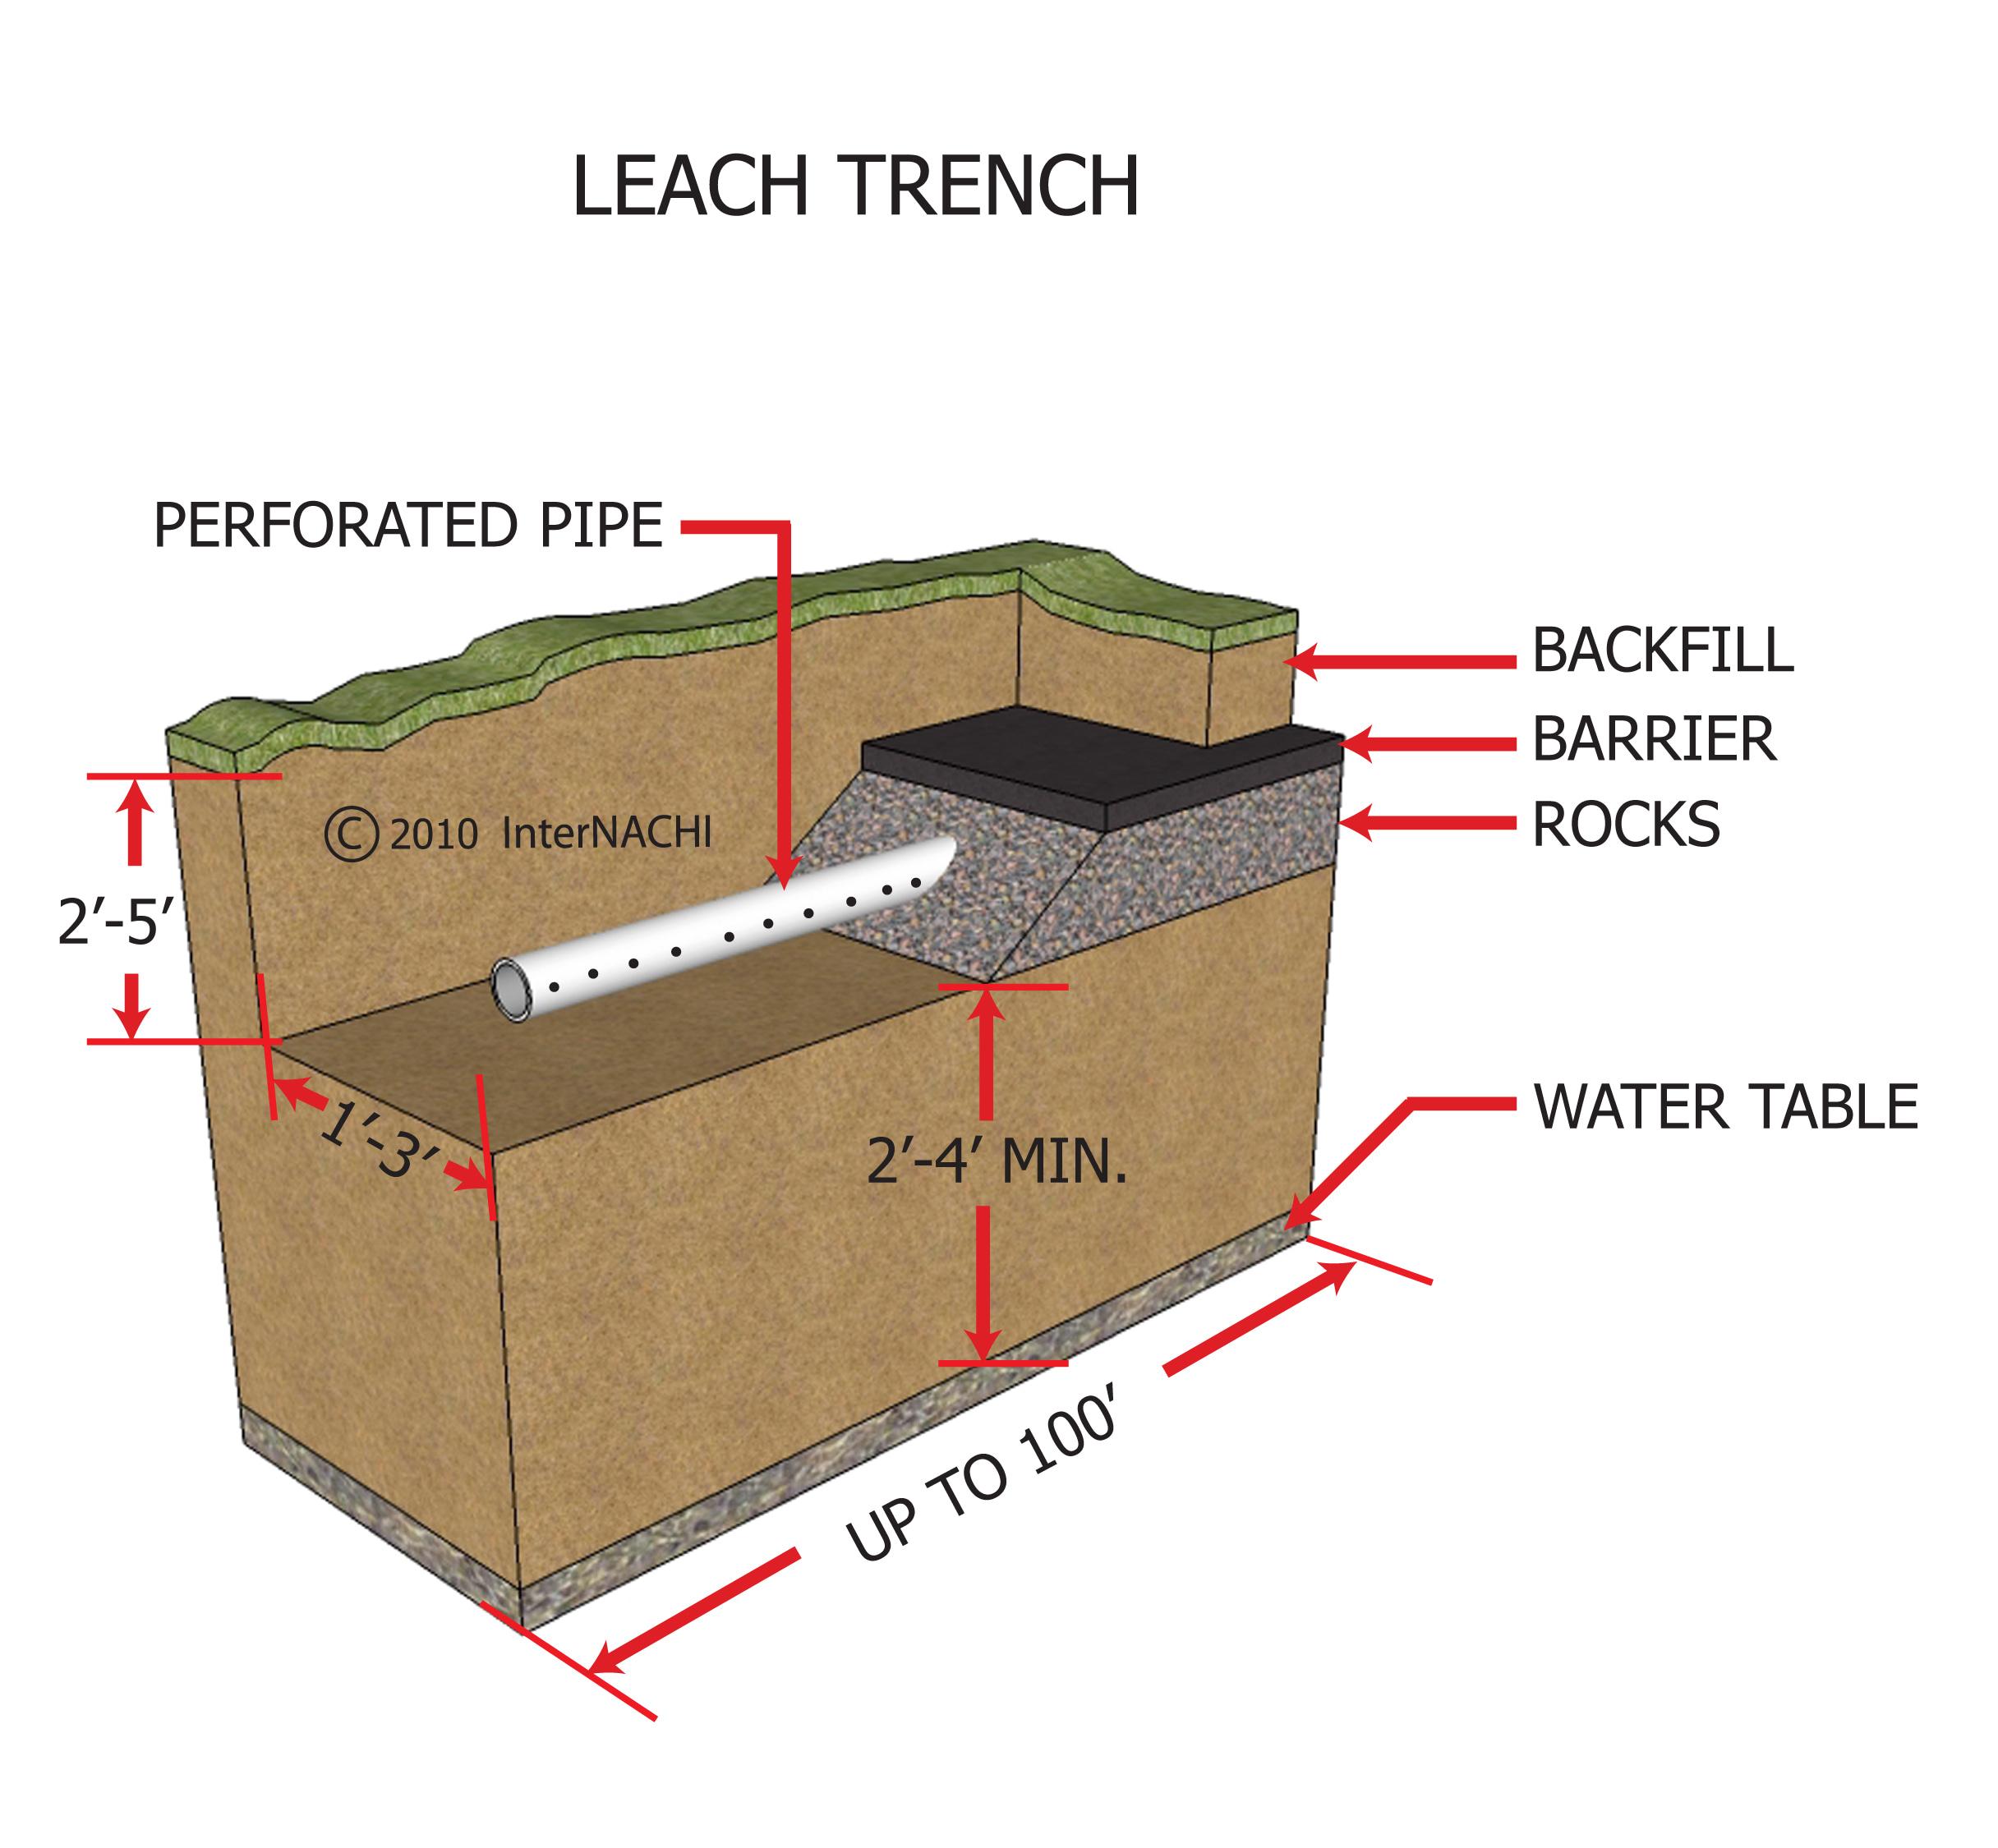 Leach trench.